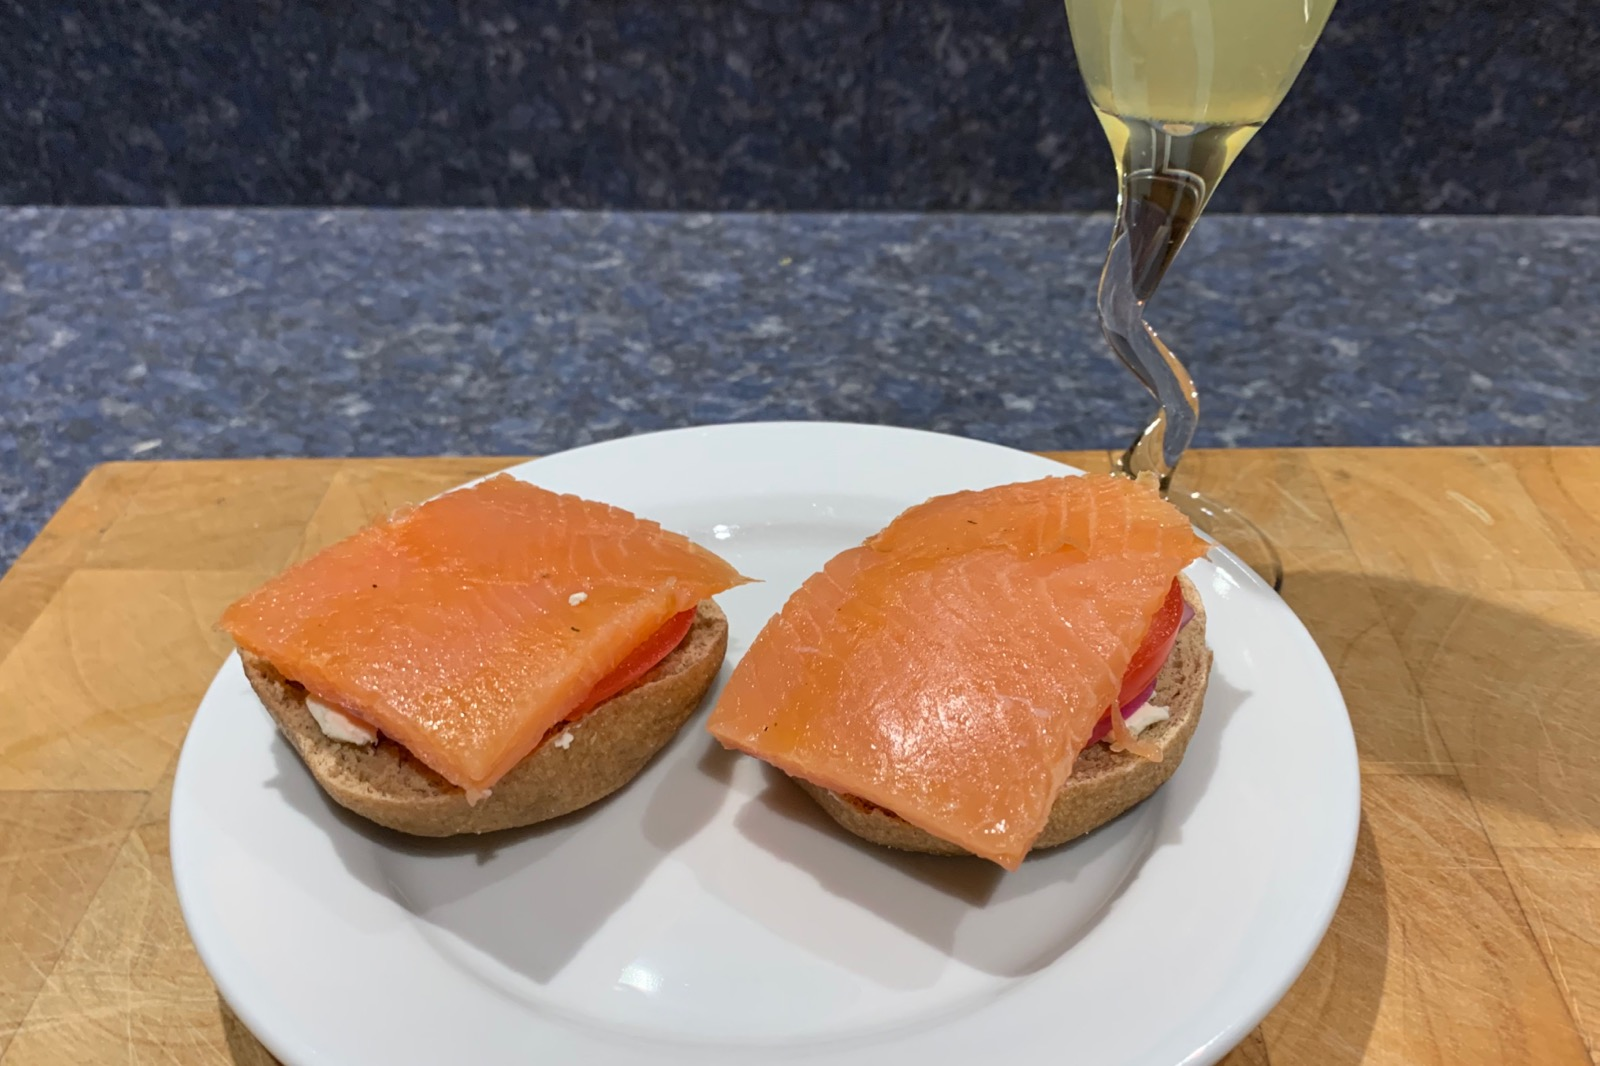 http://blog.rickk.com/food/2020/01/04/ate.2020.01.05.b.jpg